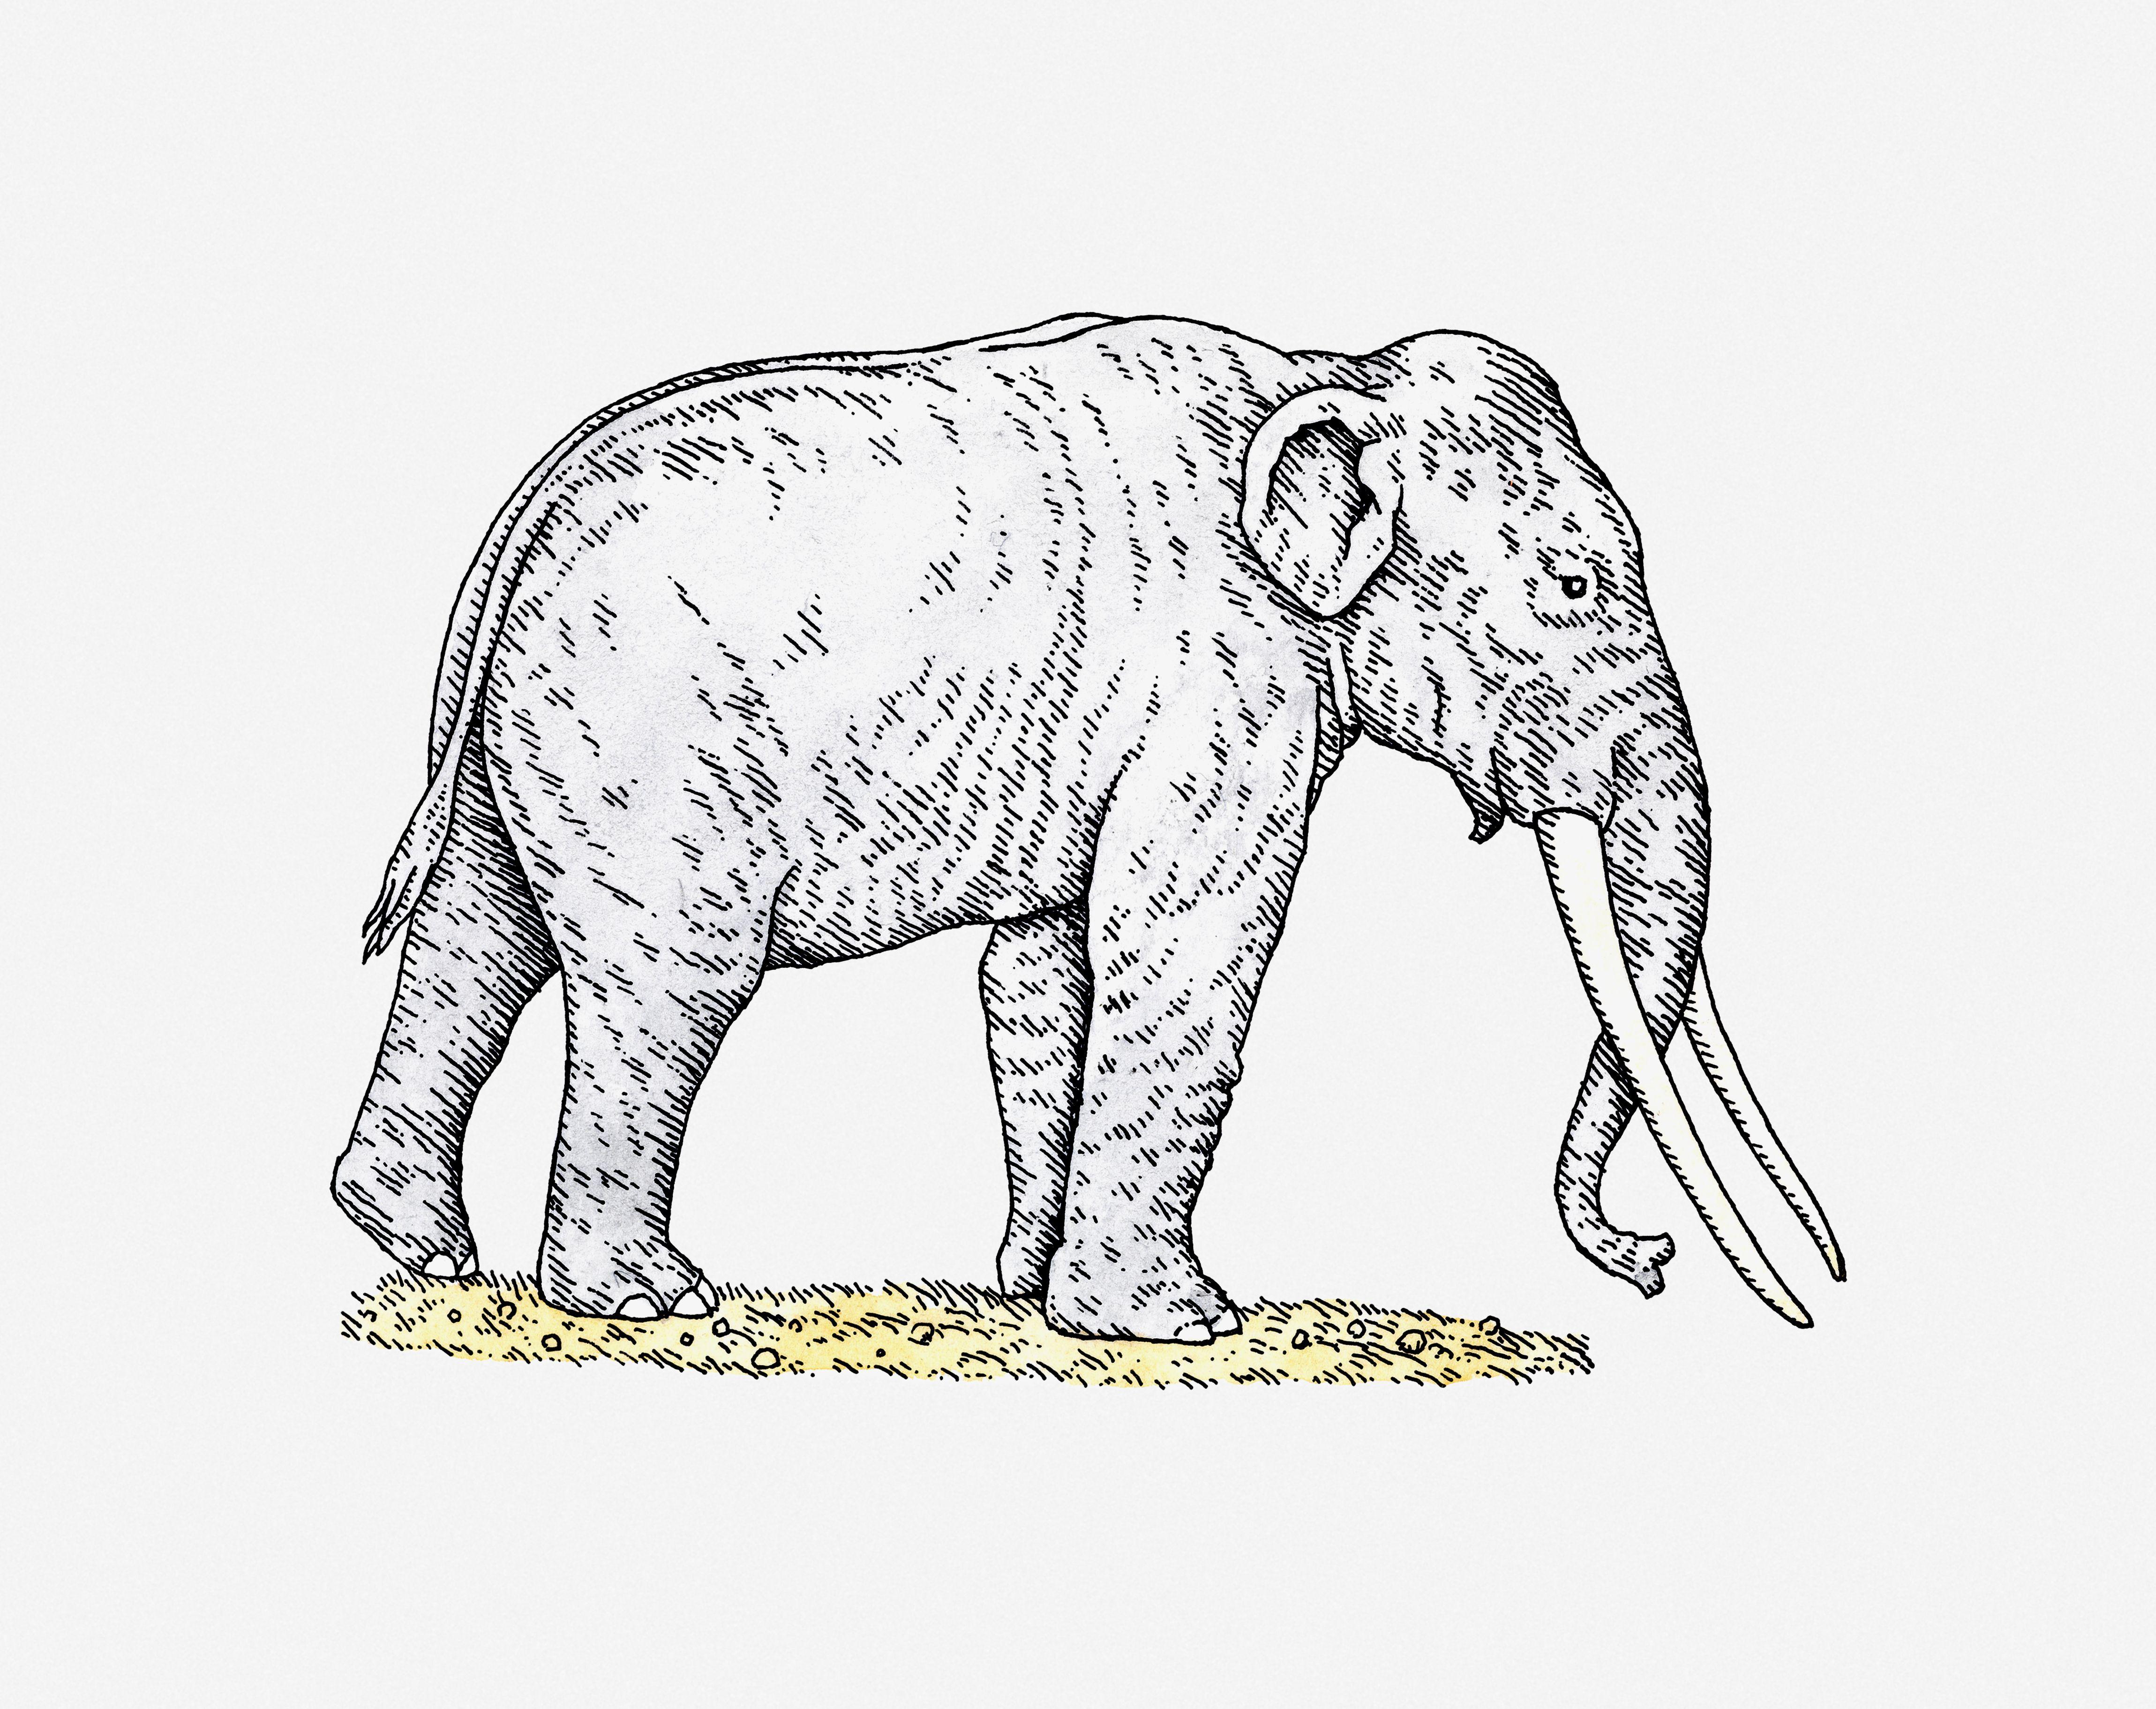 Illustration of Straight-tusked Elephant (Palaeoloxodon antiquus) from Pleistocene epoch